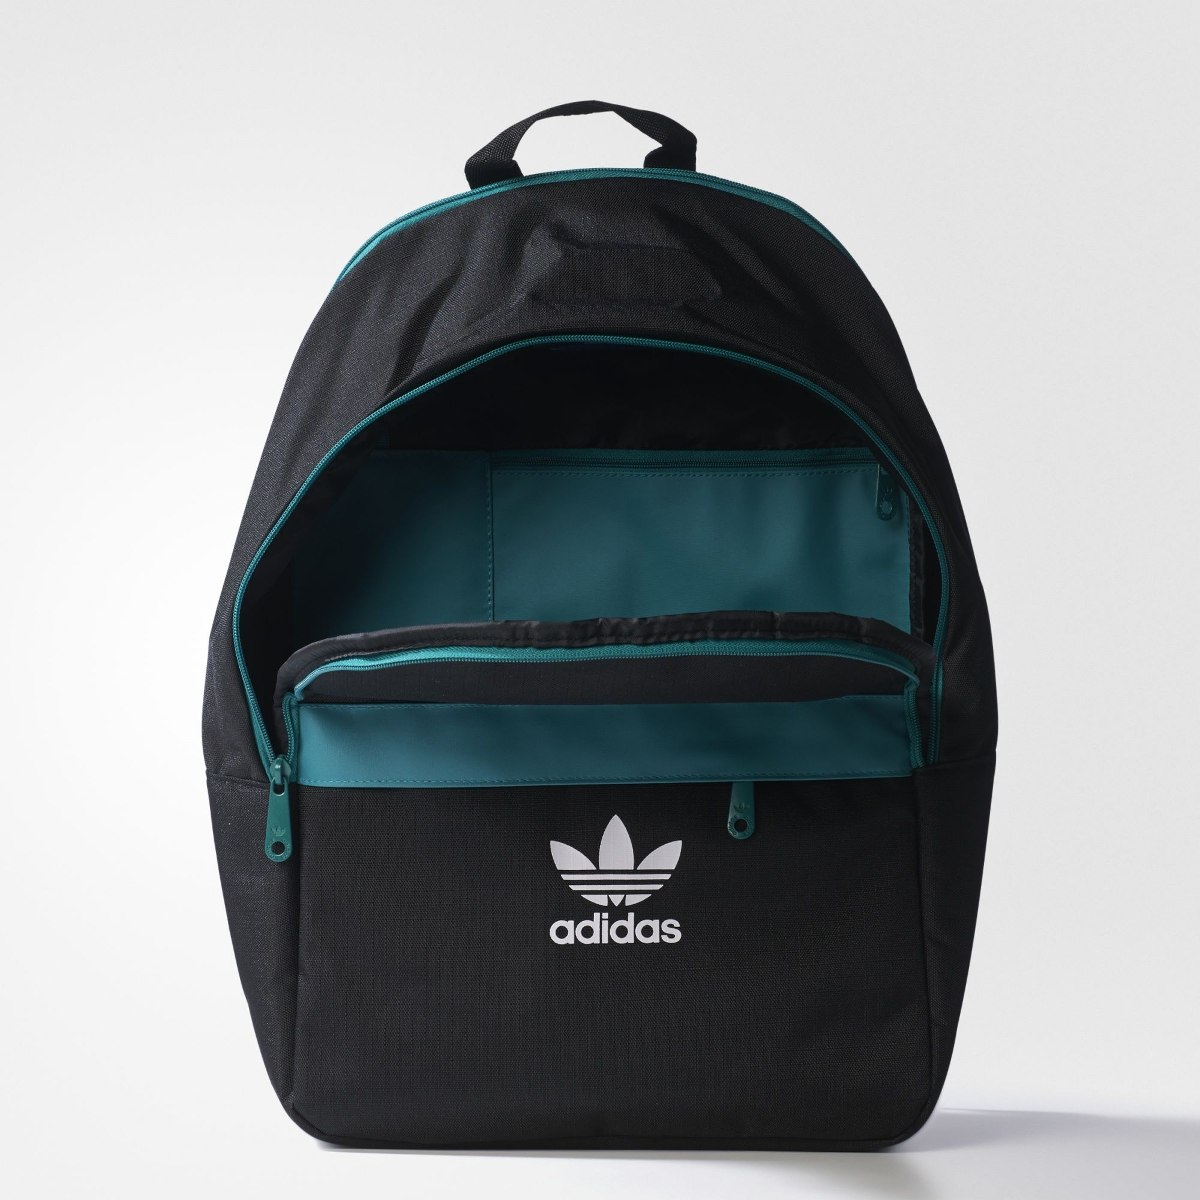 Cargando Originals Para Laptop Mochila Adidas Zoom g5EqRIRn